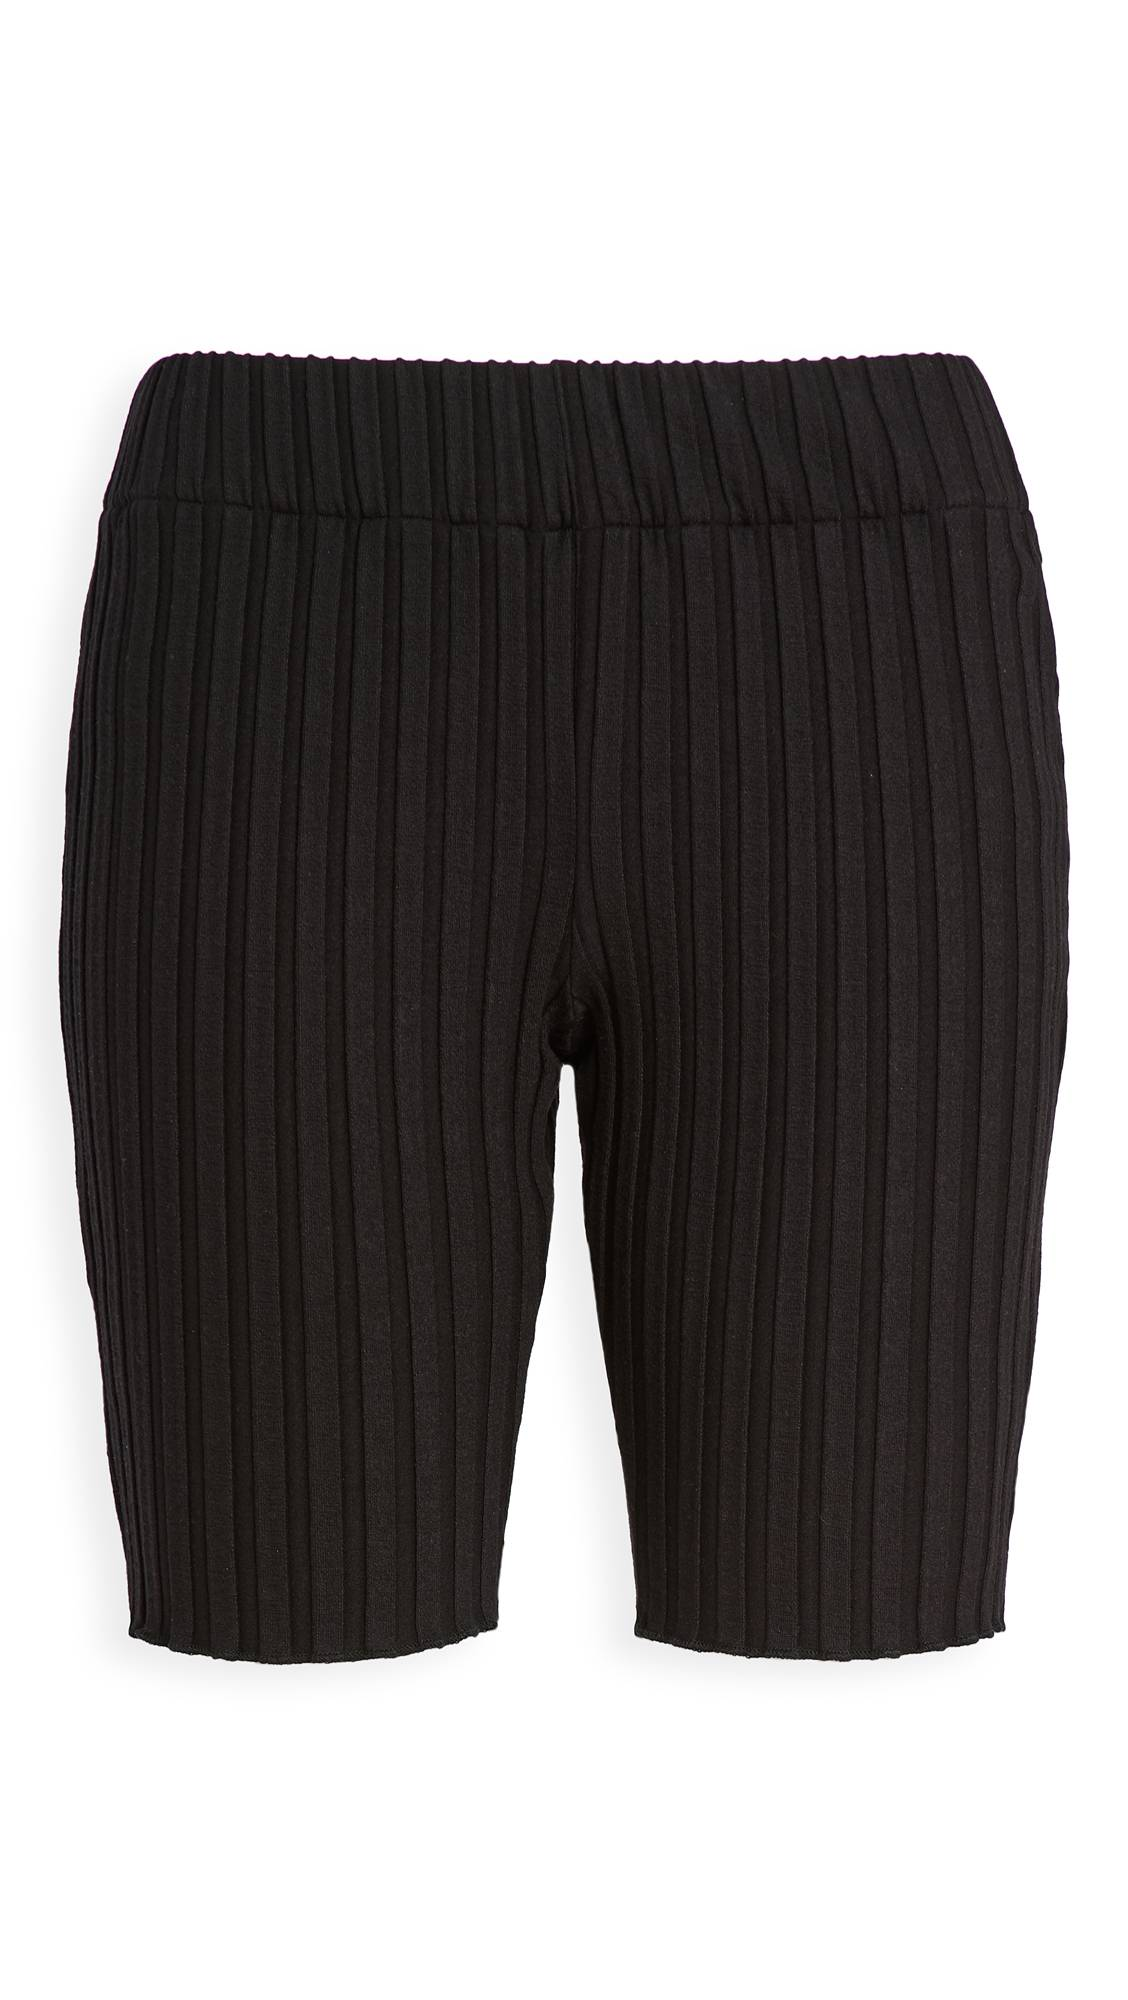 Simon Miller Burr Bike Shorts  - Black - Size: Medium